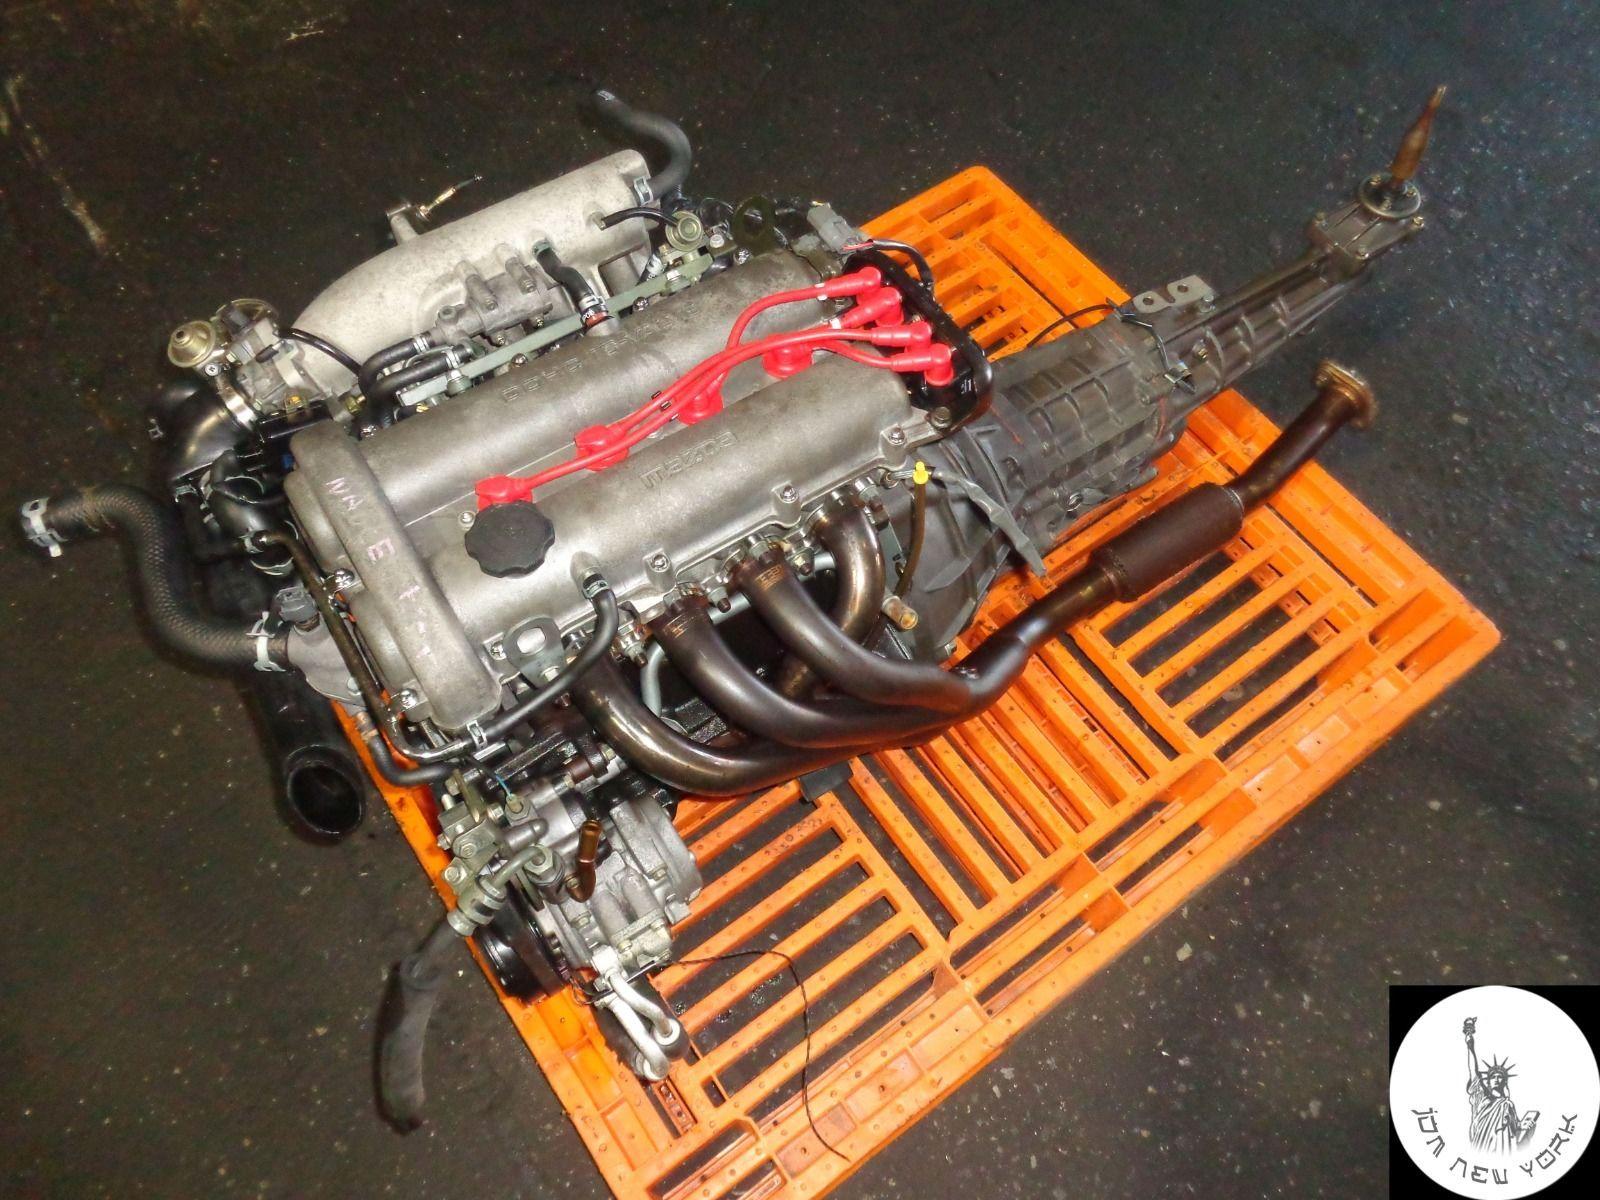 mazda mx 5 miata dohc 1 6l dohc engine 6 speed manual rwd transmission jdm b6 jdm new york